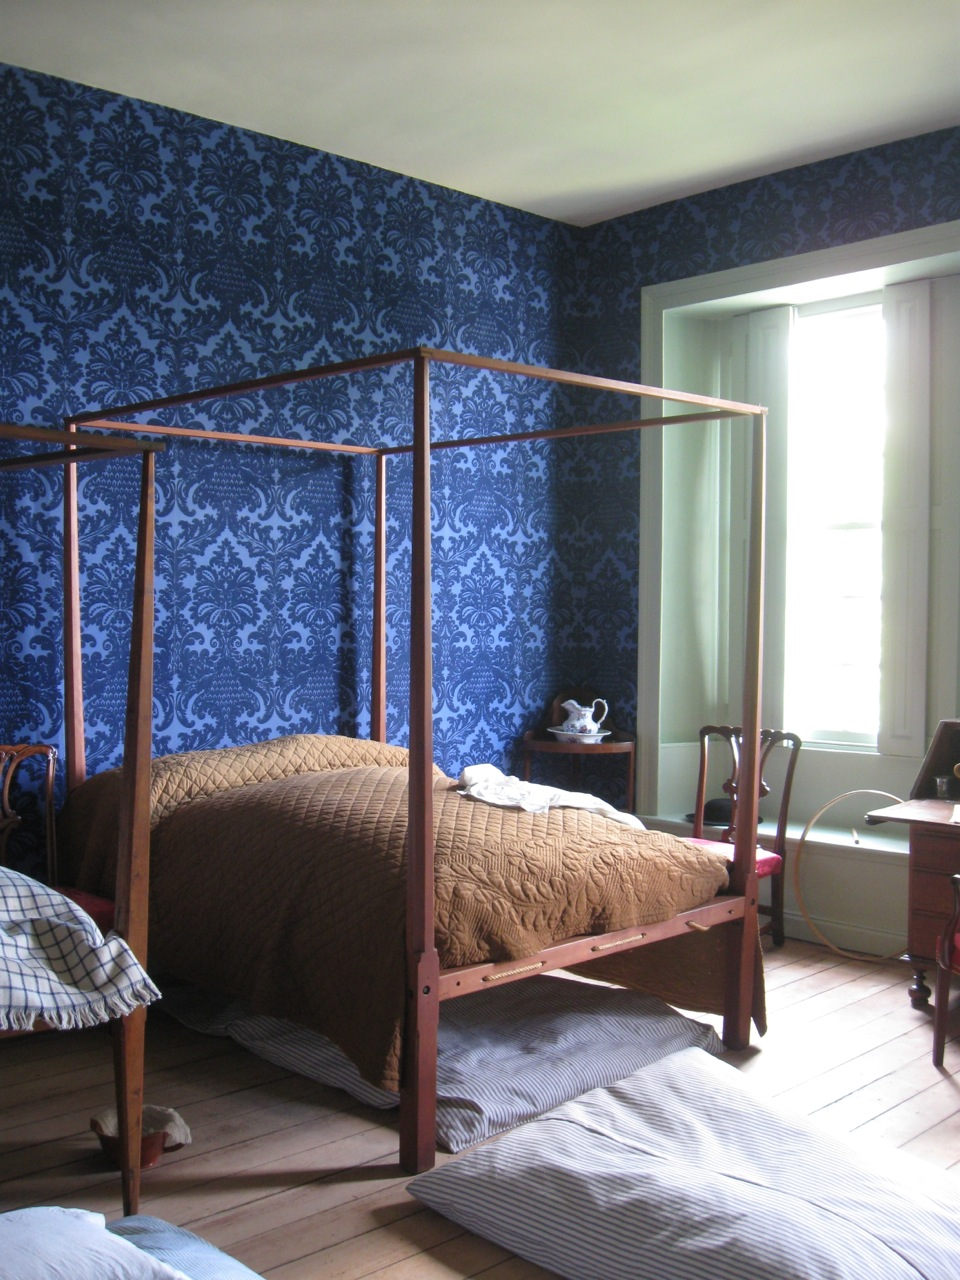 Bedroom House For Sale In Virginia Beach